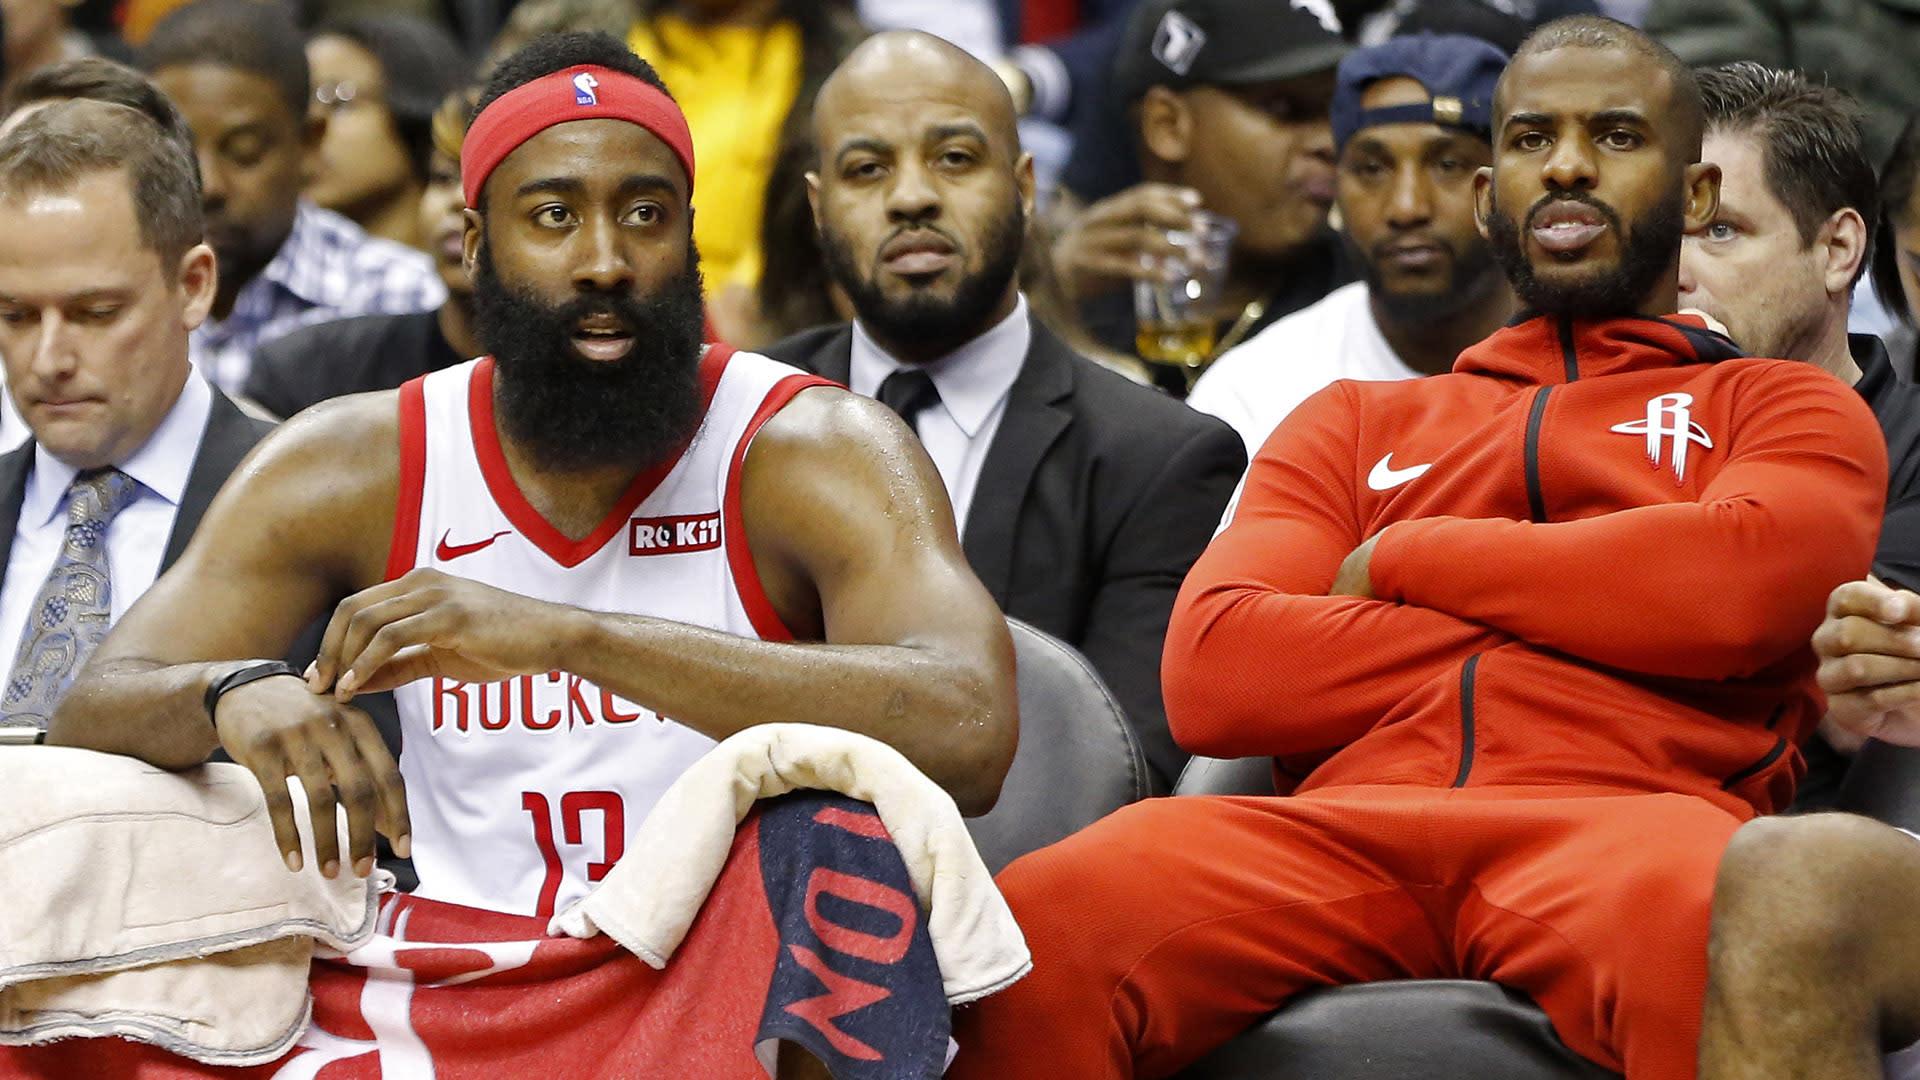 aa41fba910a NBA rumors: 'Culture of me' plaguing Rockets as Chris Paul demands trade